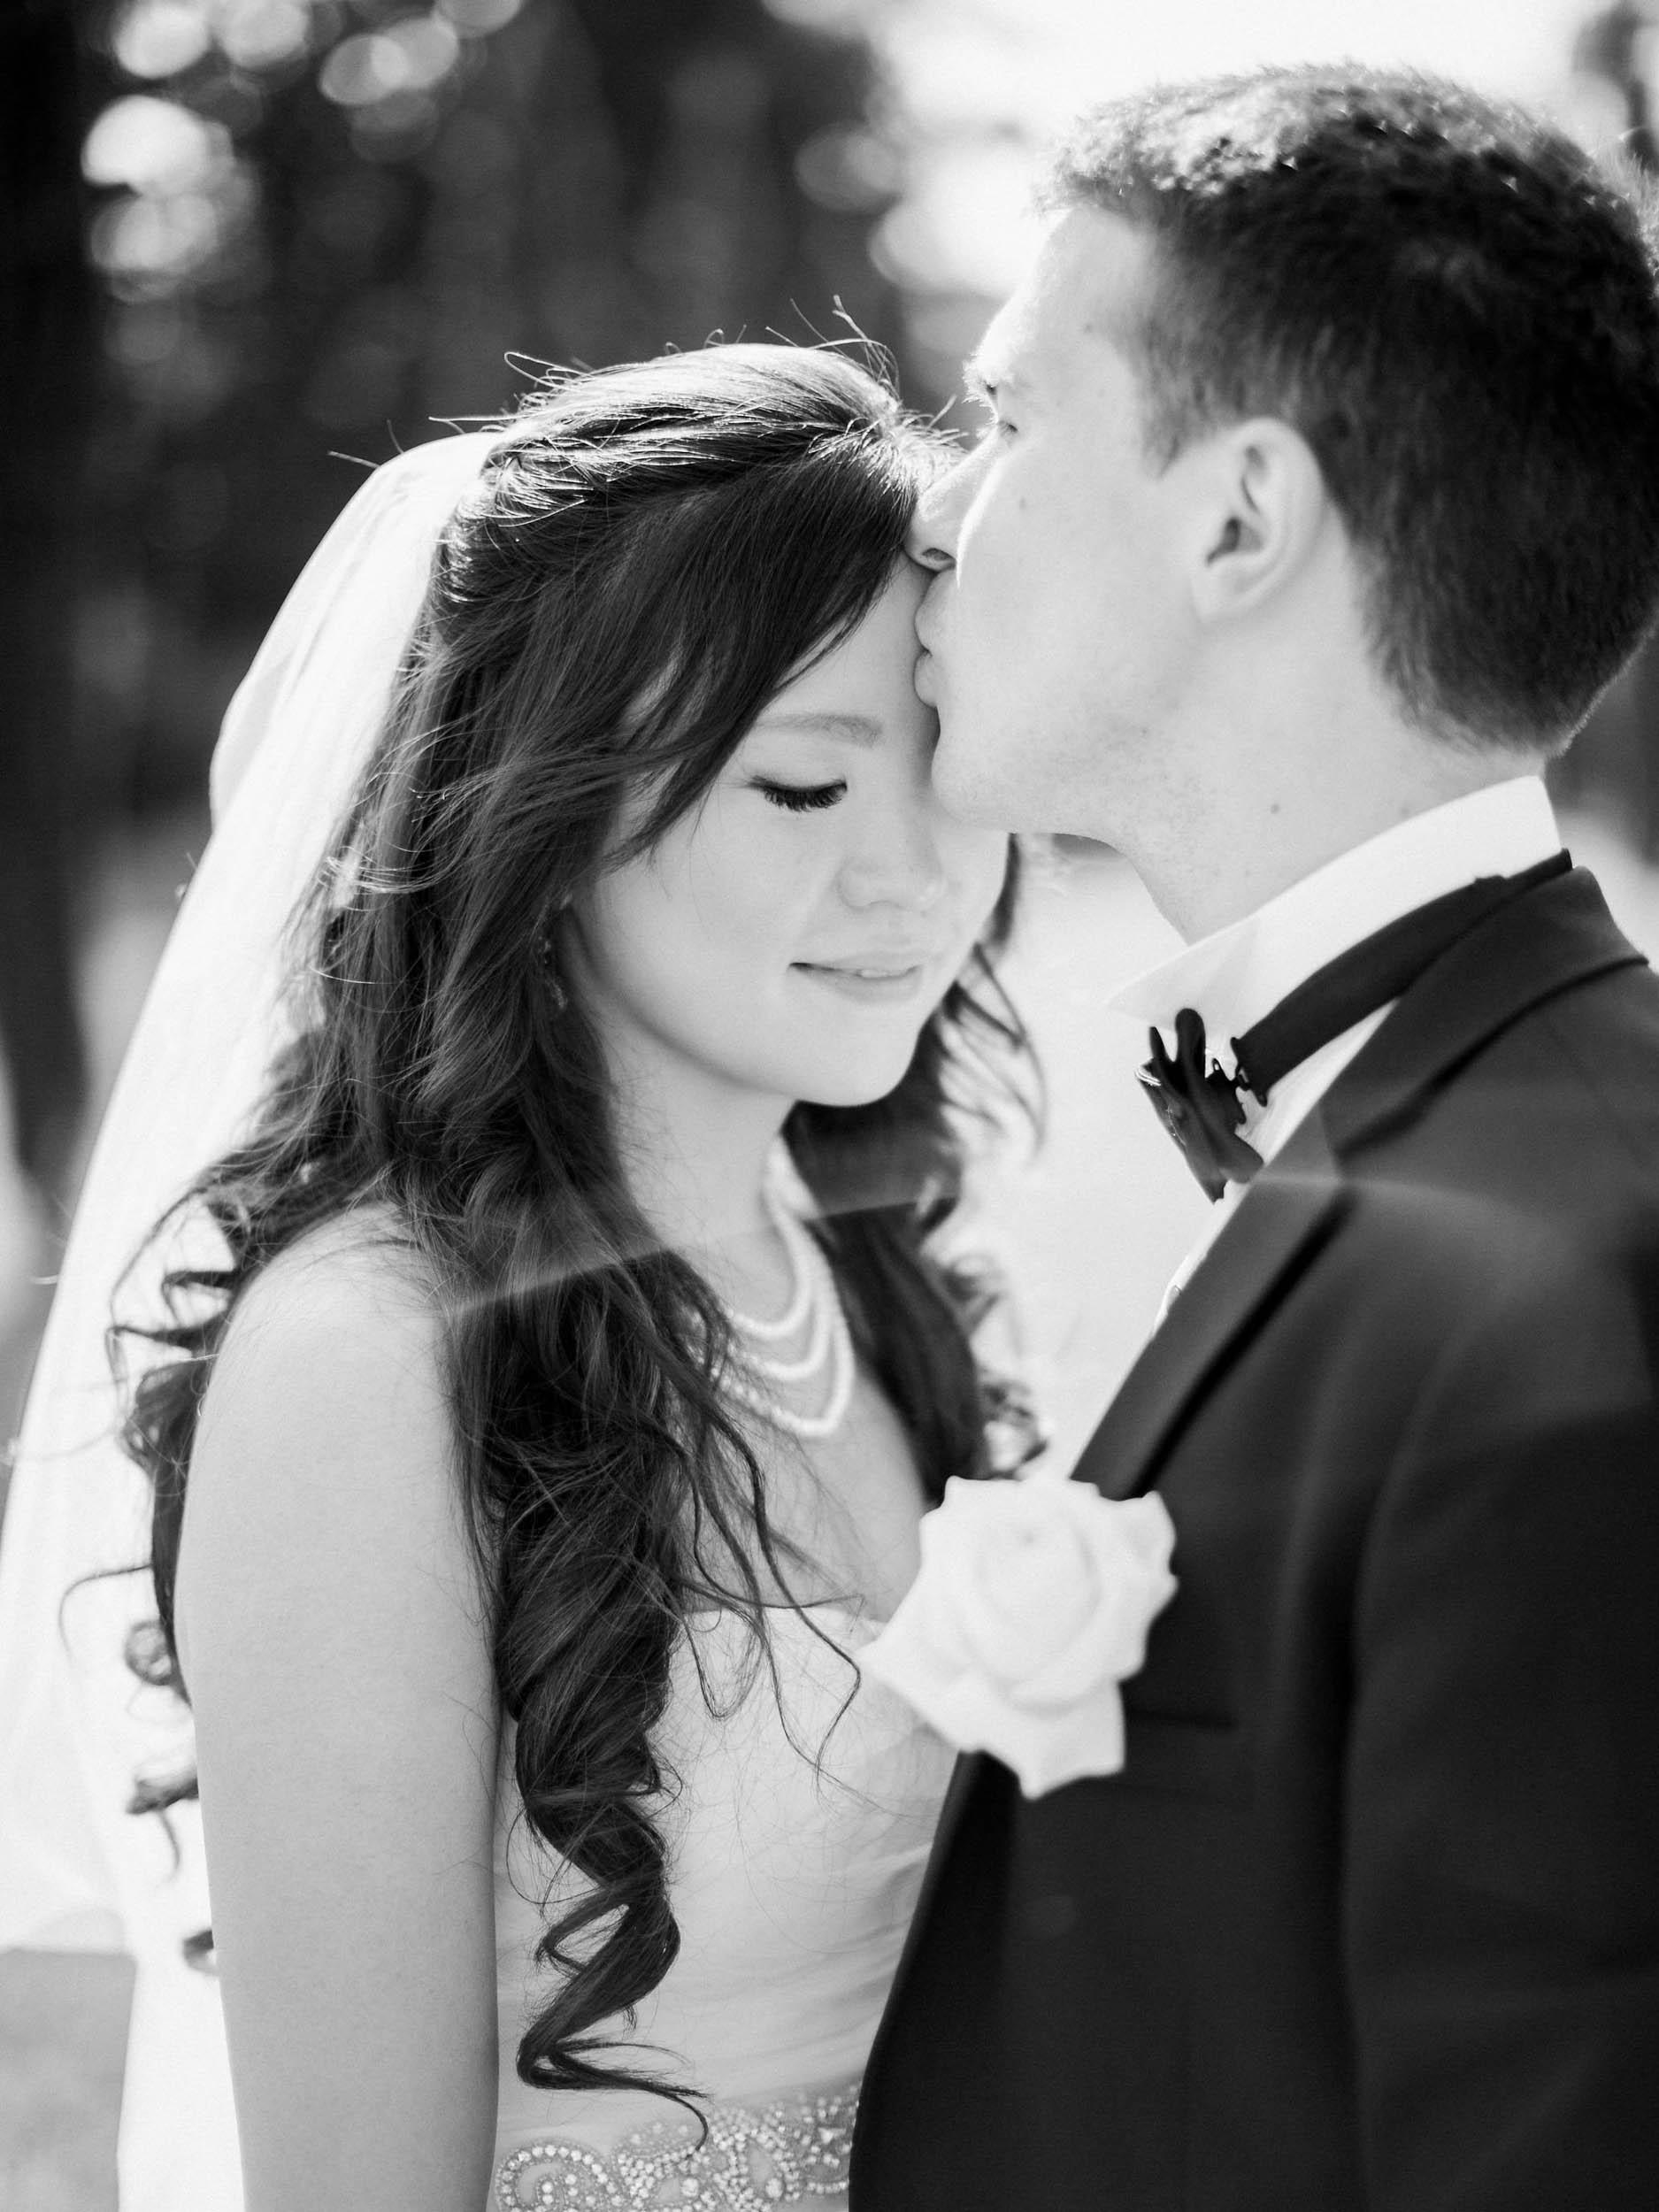 Amy O'Boyle Photography- Destination & UK Fine Art Film Wedding Photographer- Chateau La Durantie Wedding-44.jpg